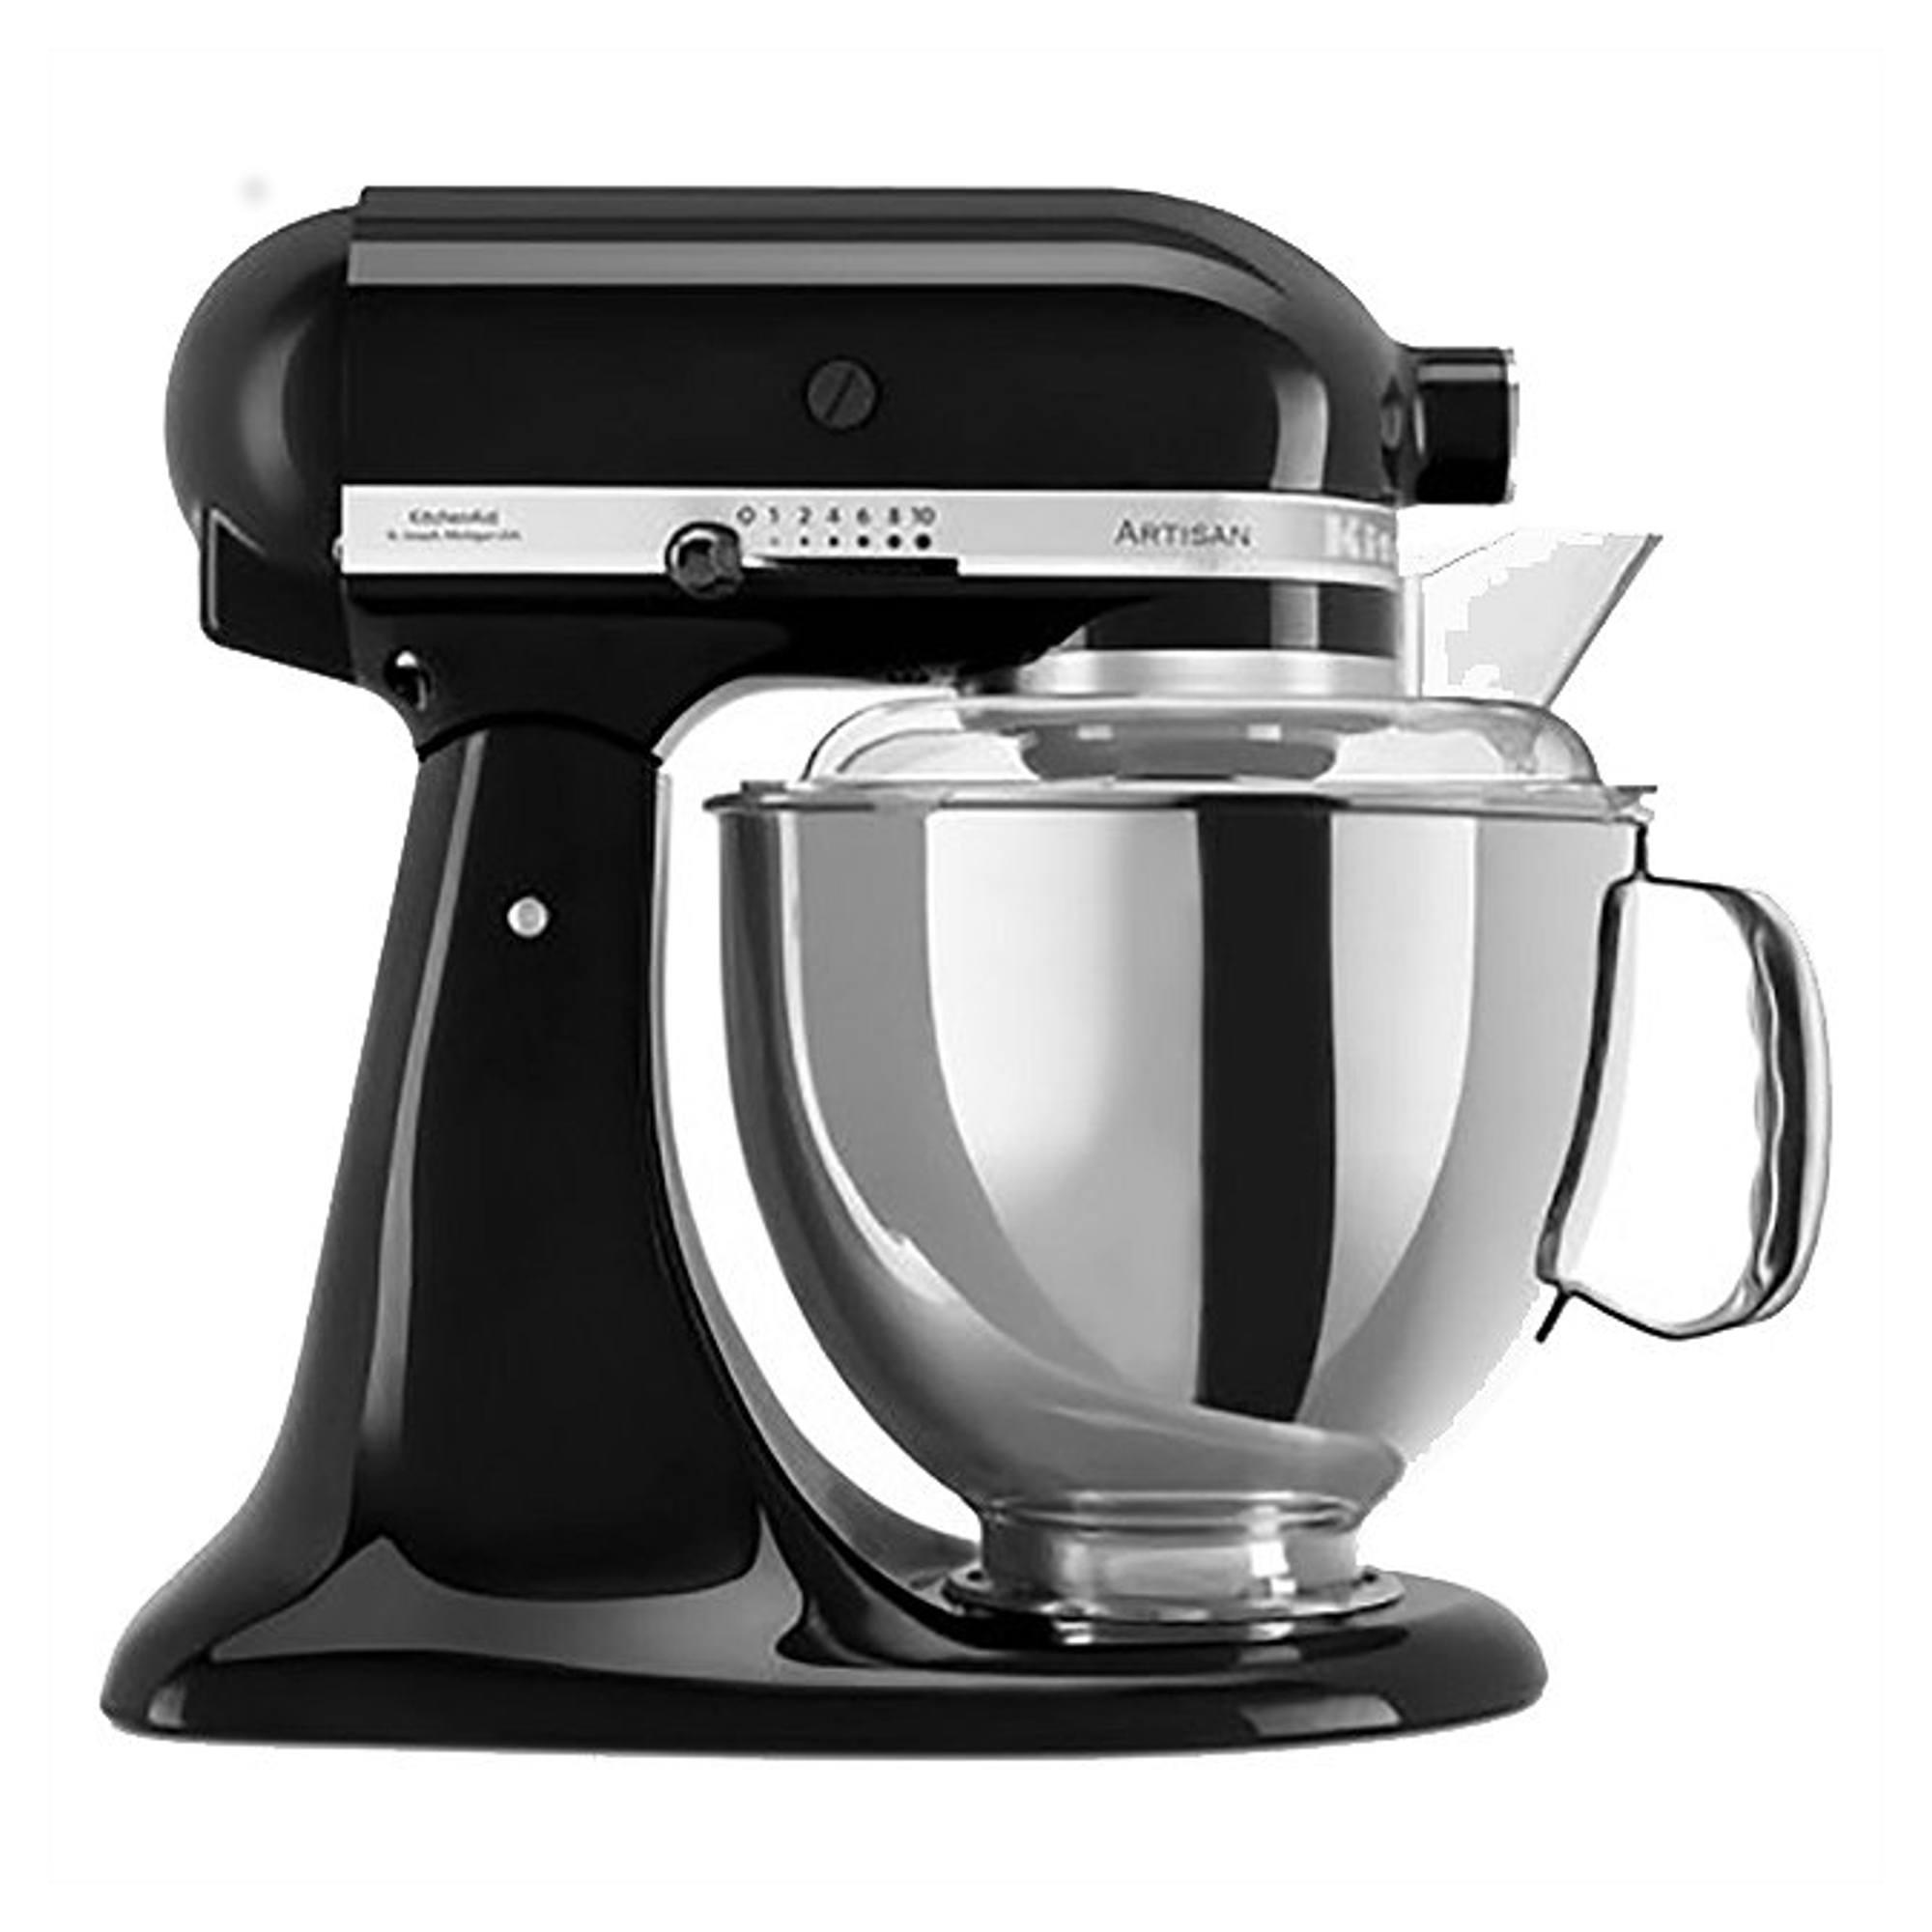 Kitchenaid 5ksm175psbob 300w 4 8l Artisan Stand Mixer Hughes